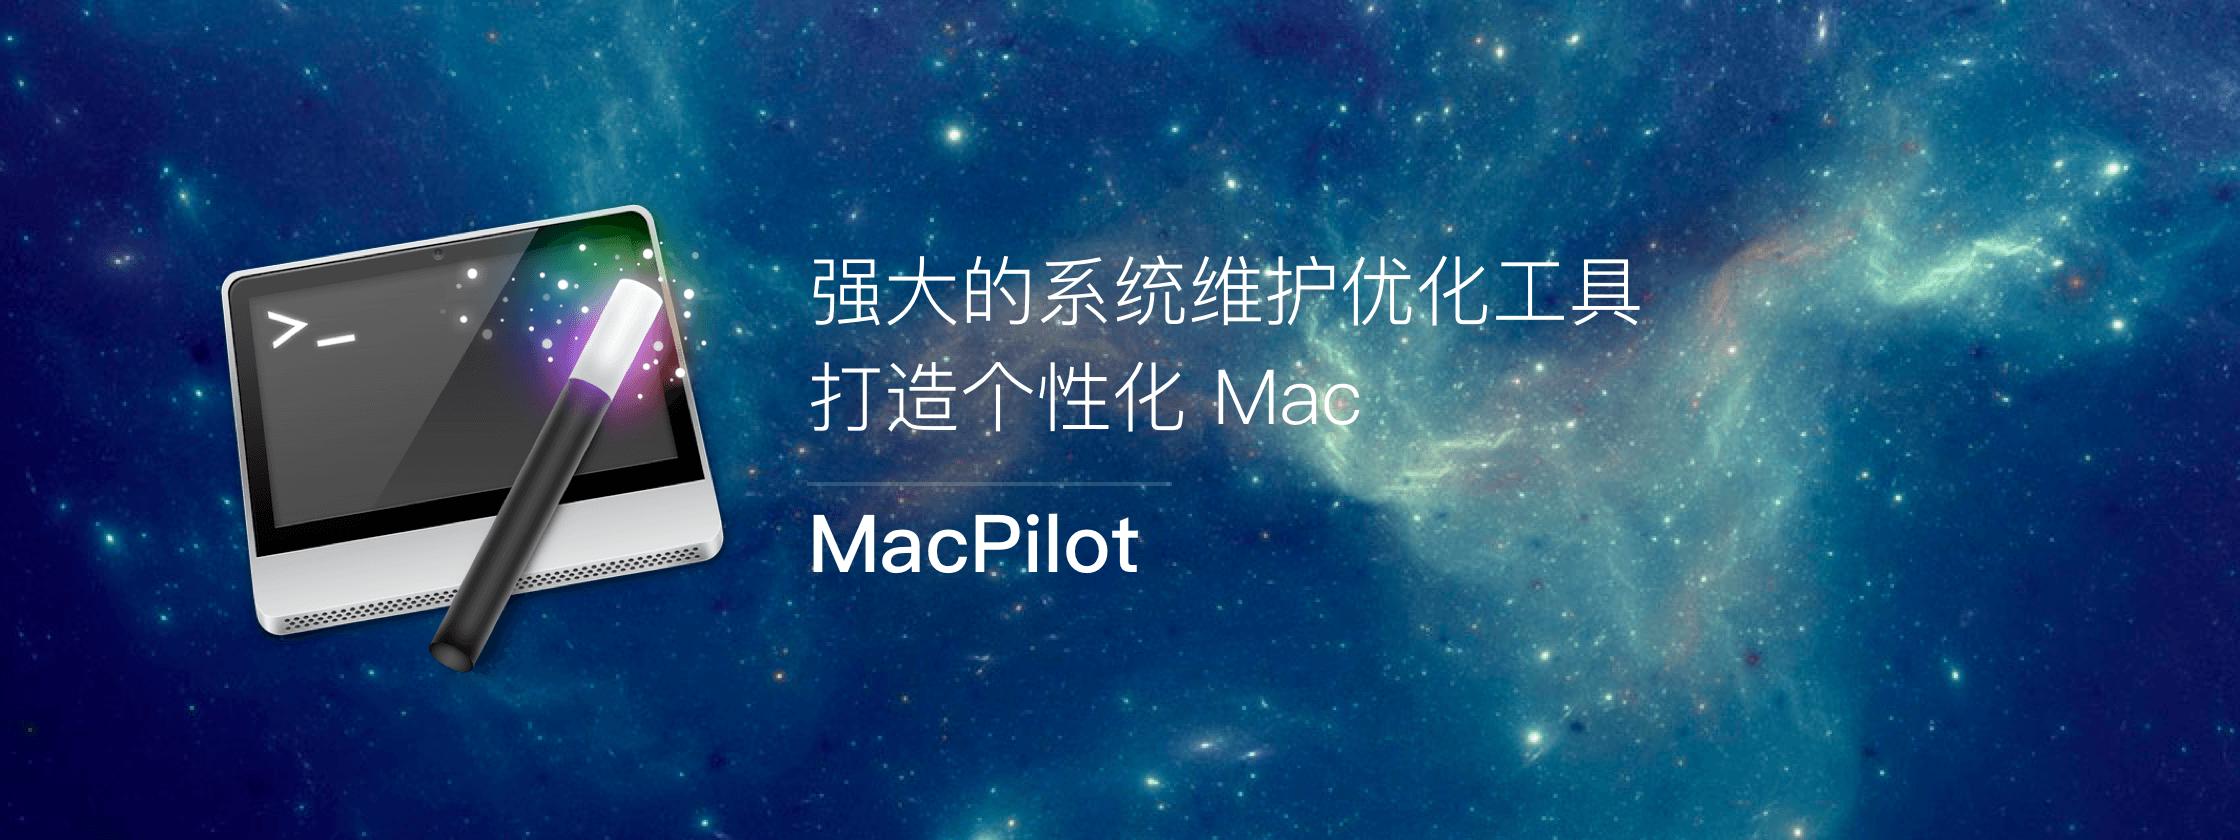 MacPilot – 强大的系统维护优化工具 打造个性化 Mac